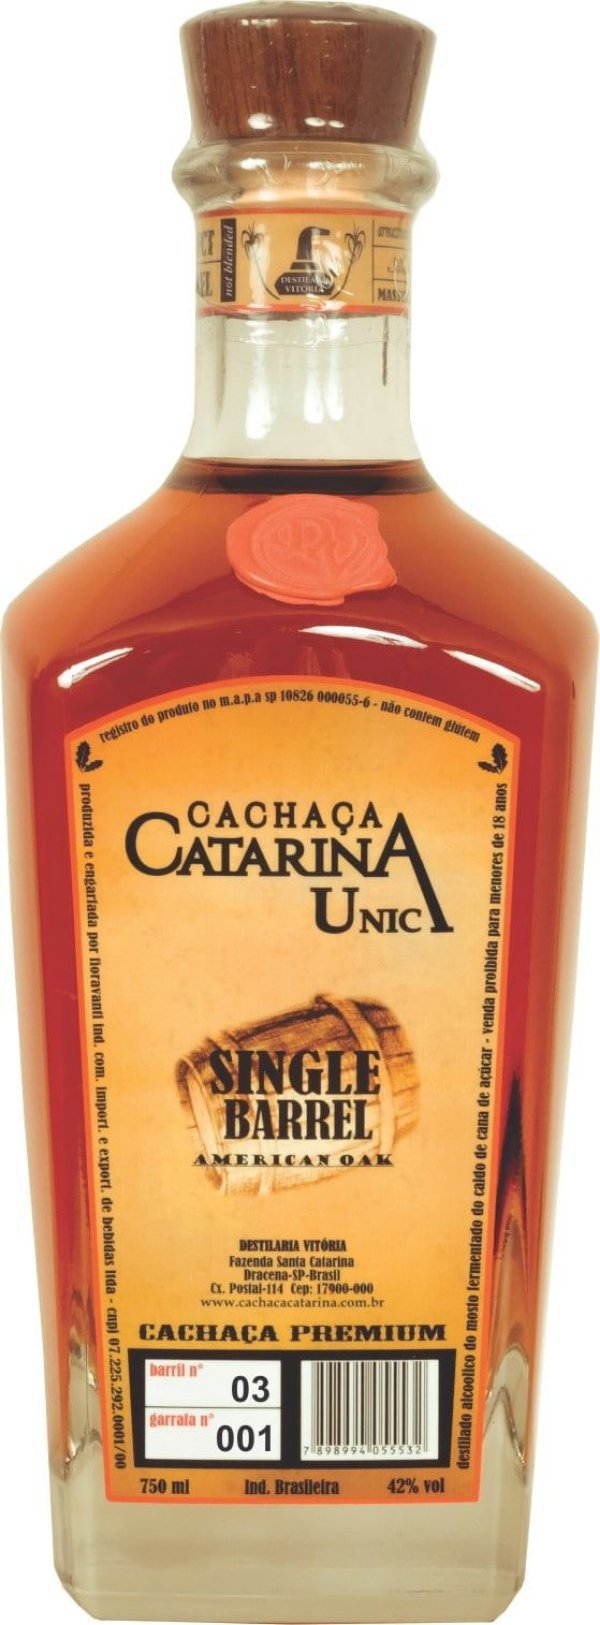 Cachaça Catarina Única Single Barrel 750ml